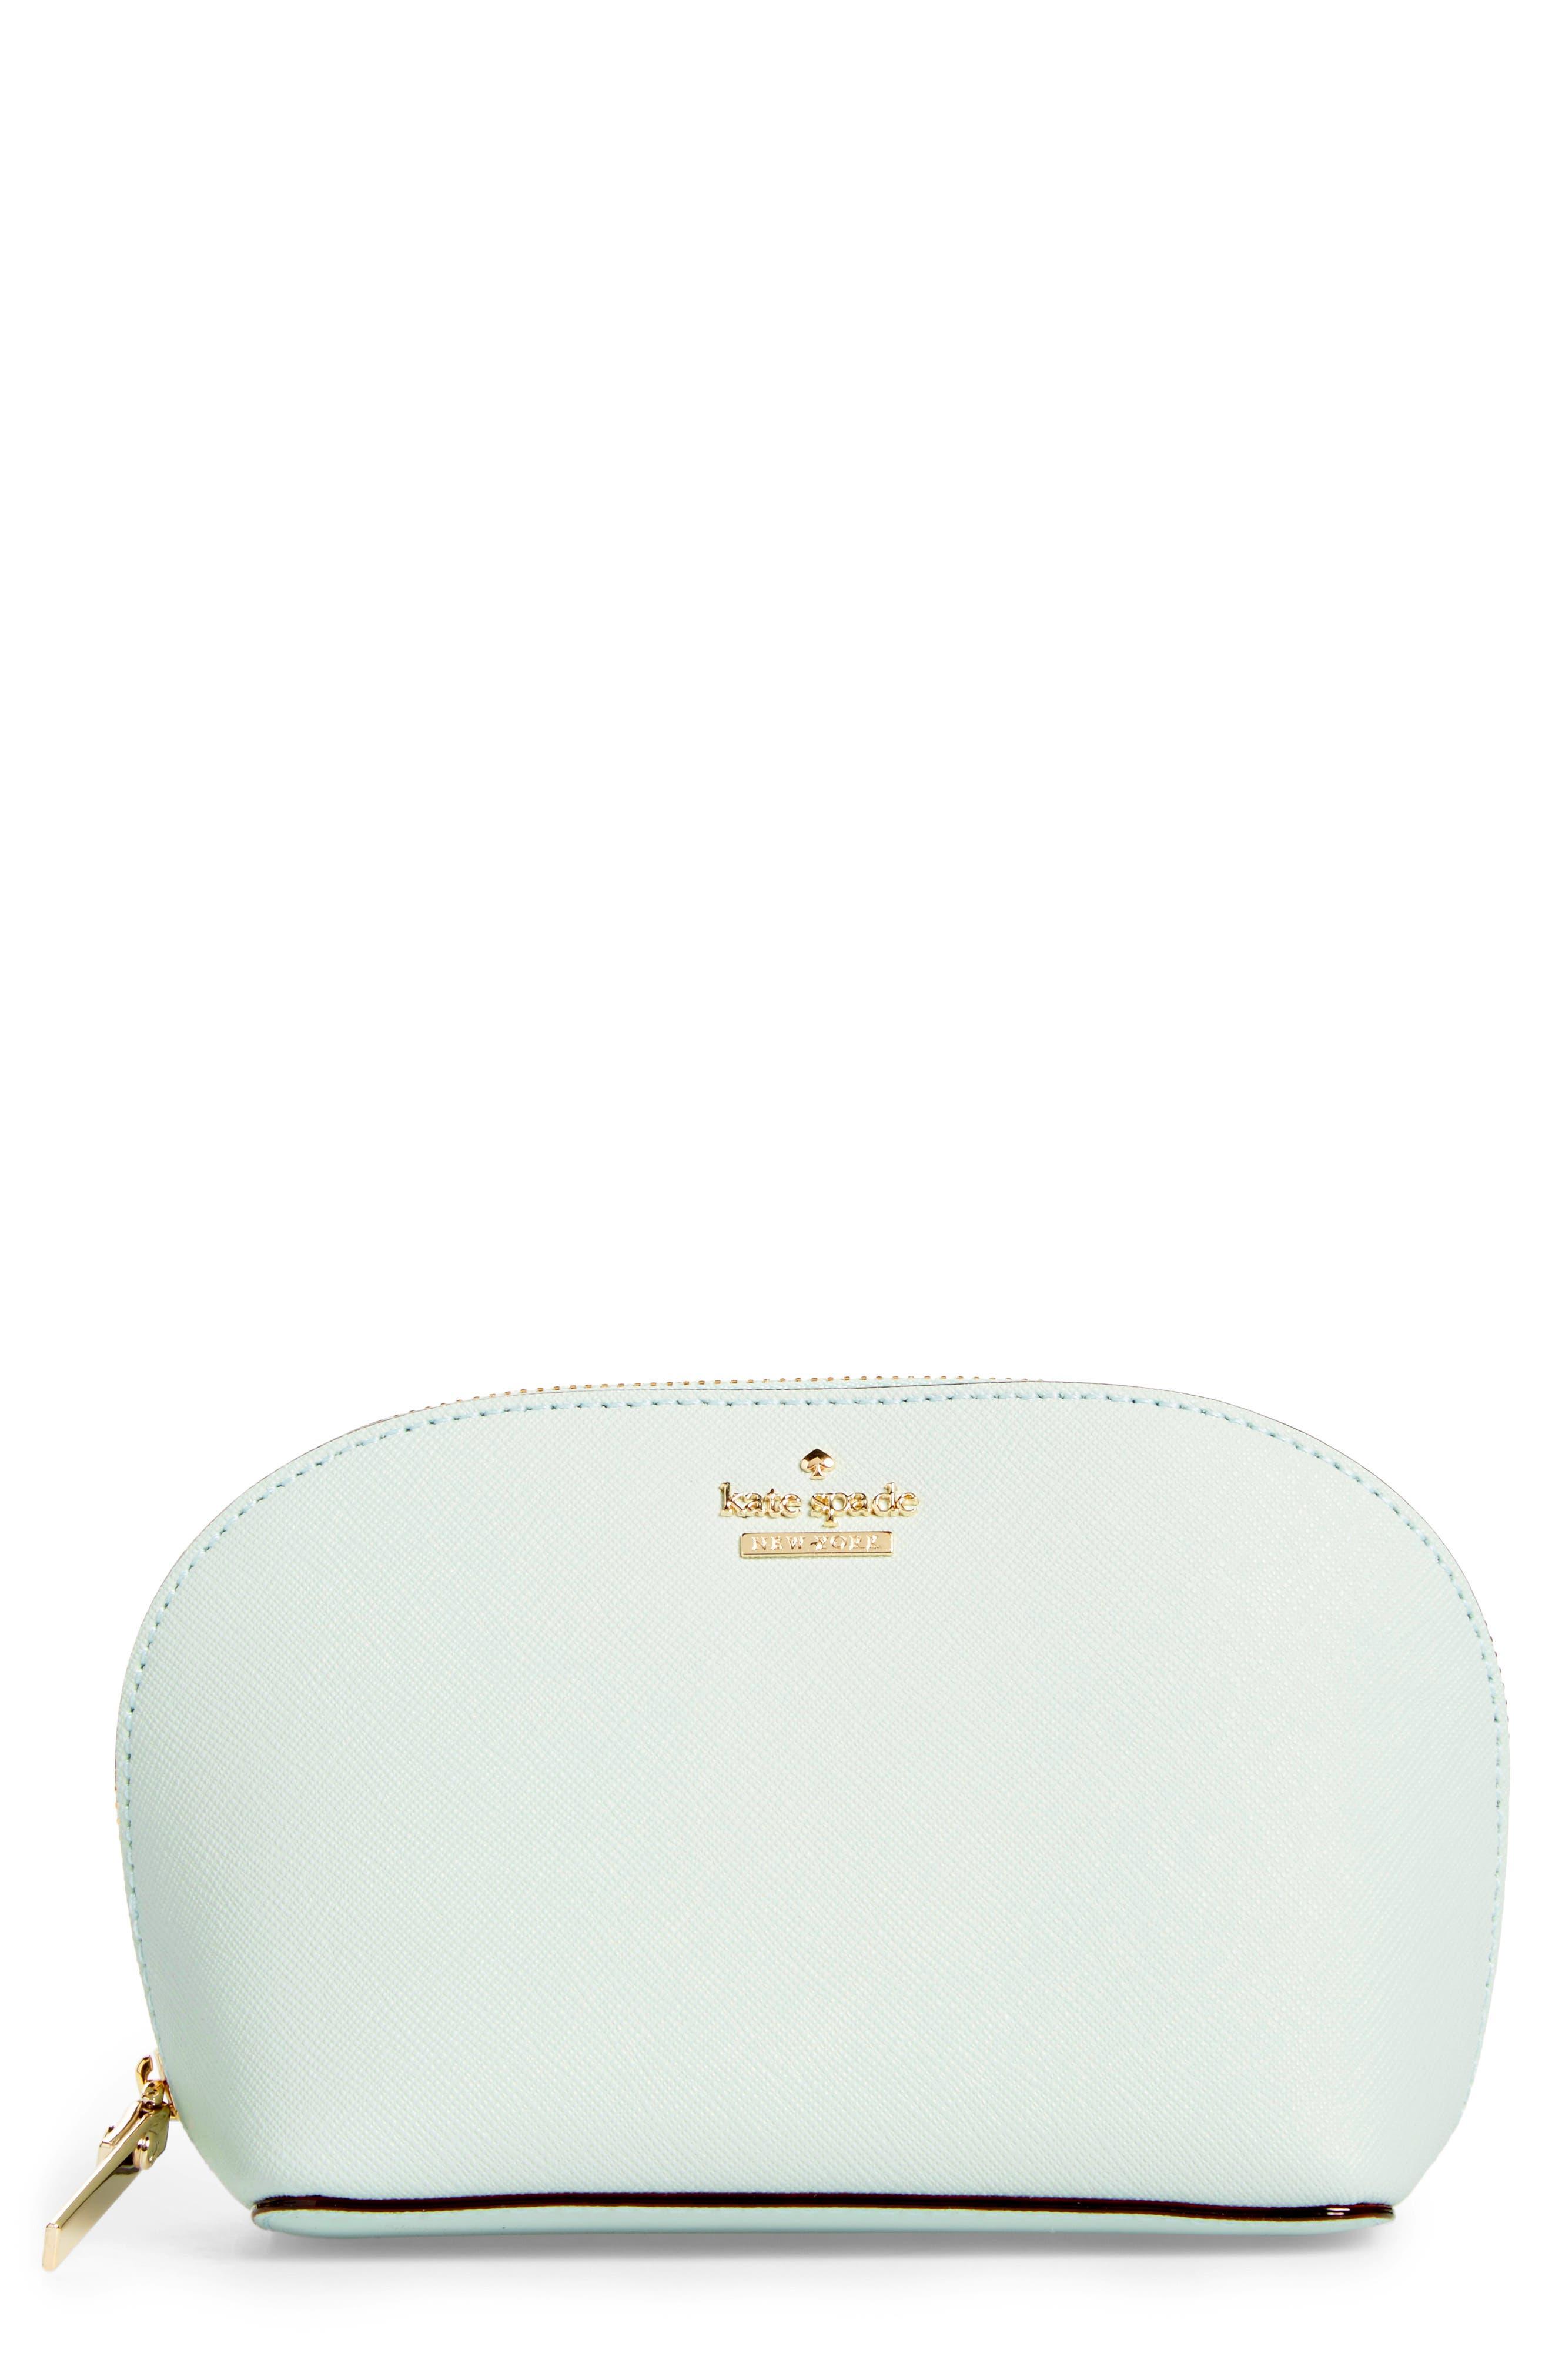 cameron street - small abalene leather cosmetics bag,                         Main,                         color, Misty Mint